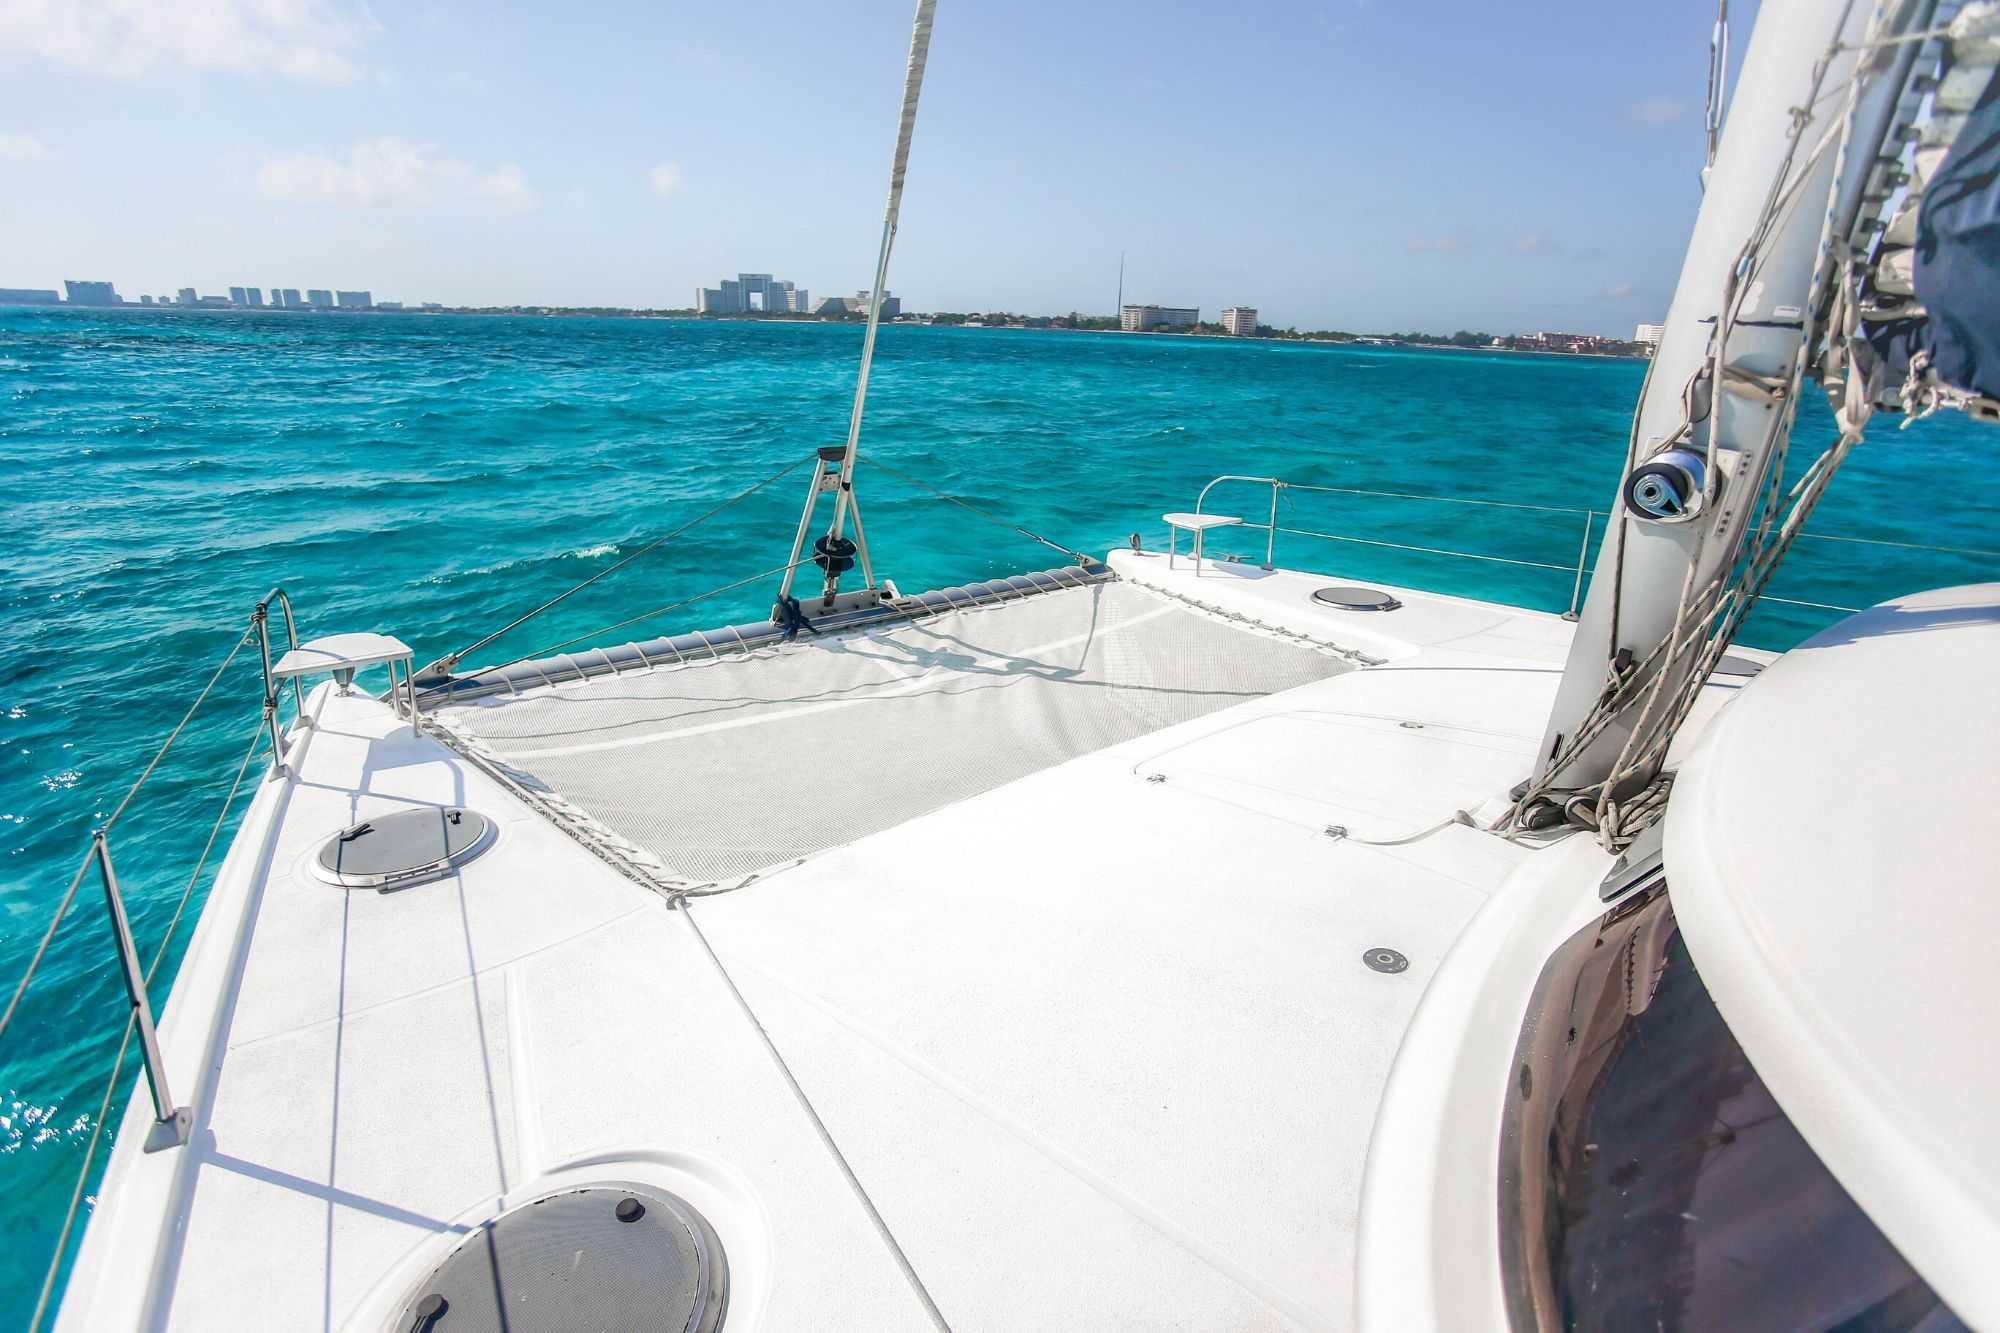 Lady Caroline - Isla Mujeres Catamaran Tour - Cancun Sailing - 2